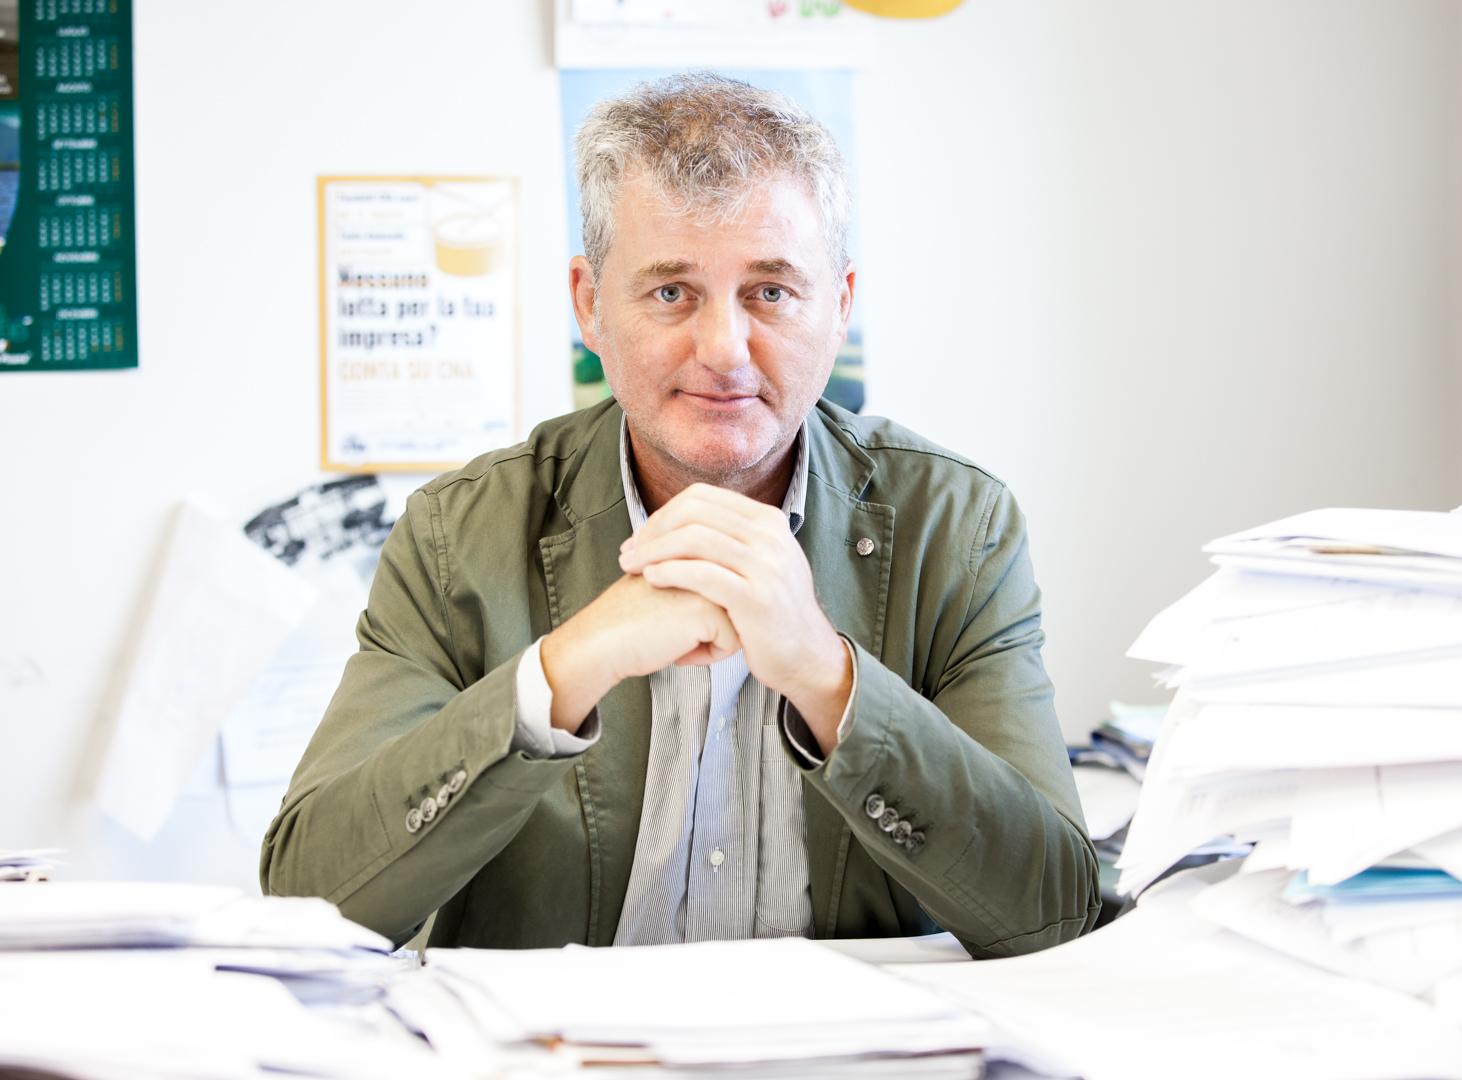 Maurizio Bandecchi